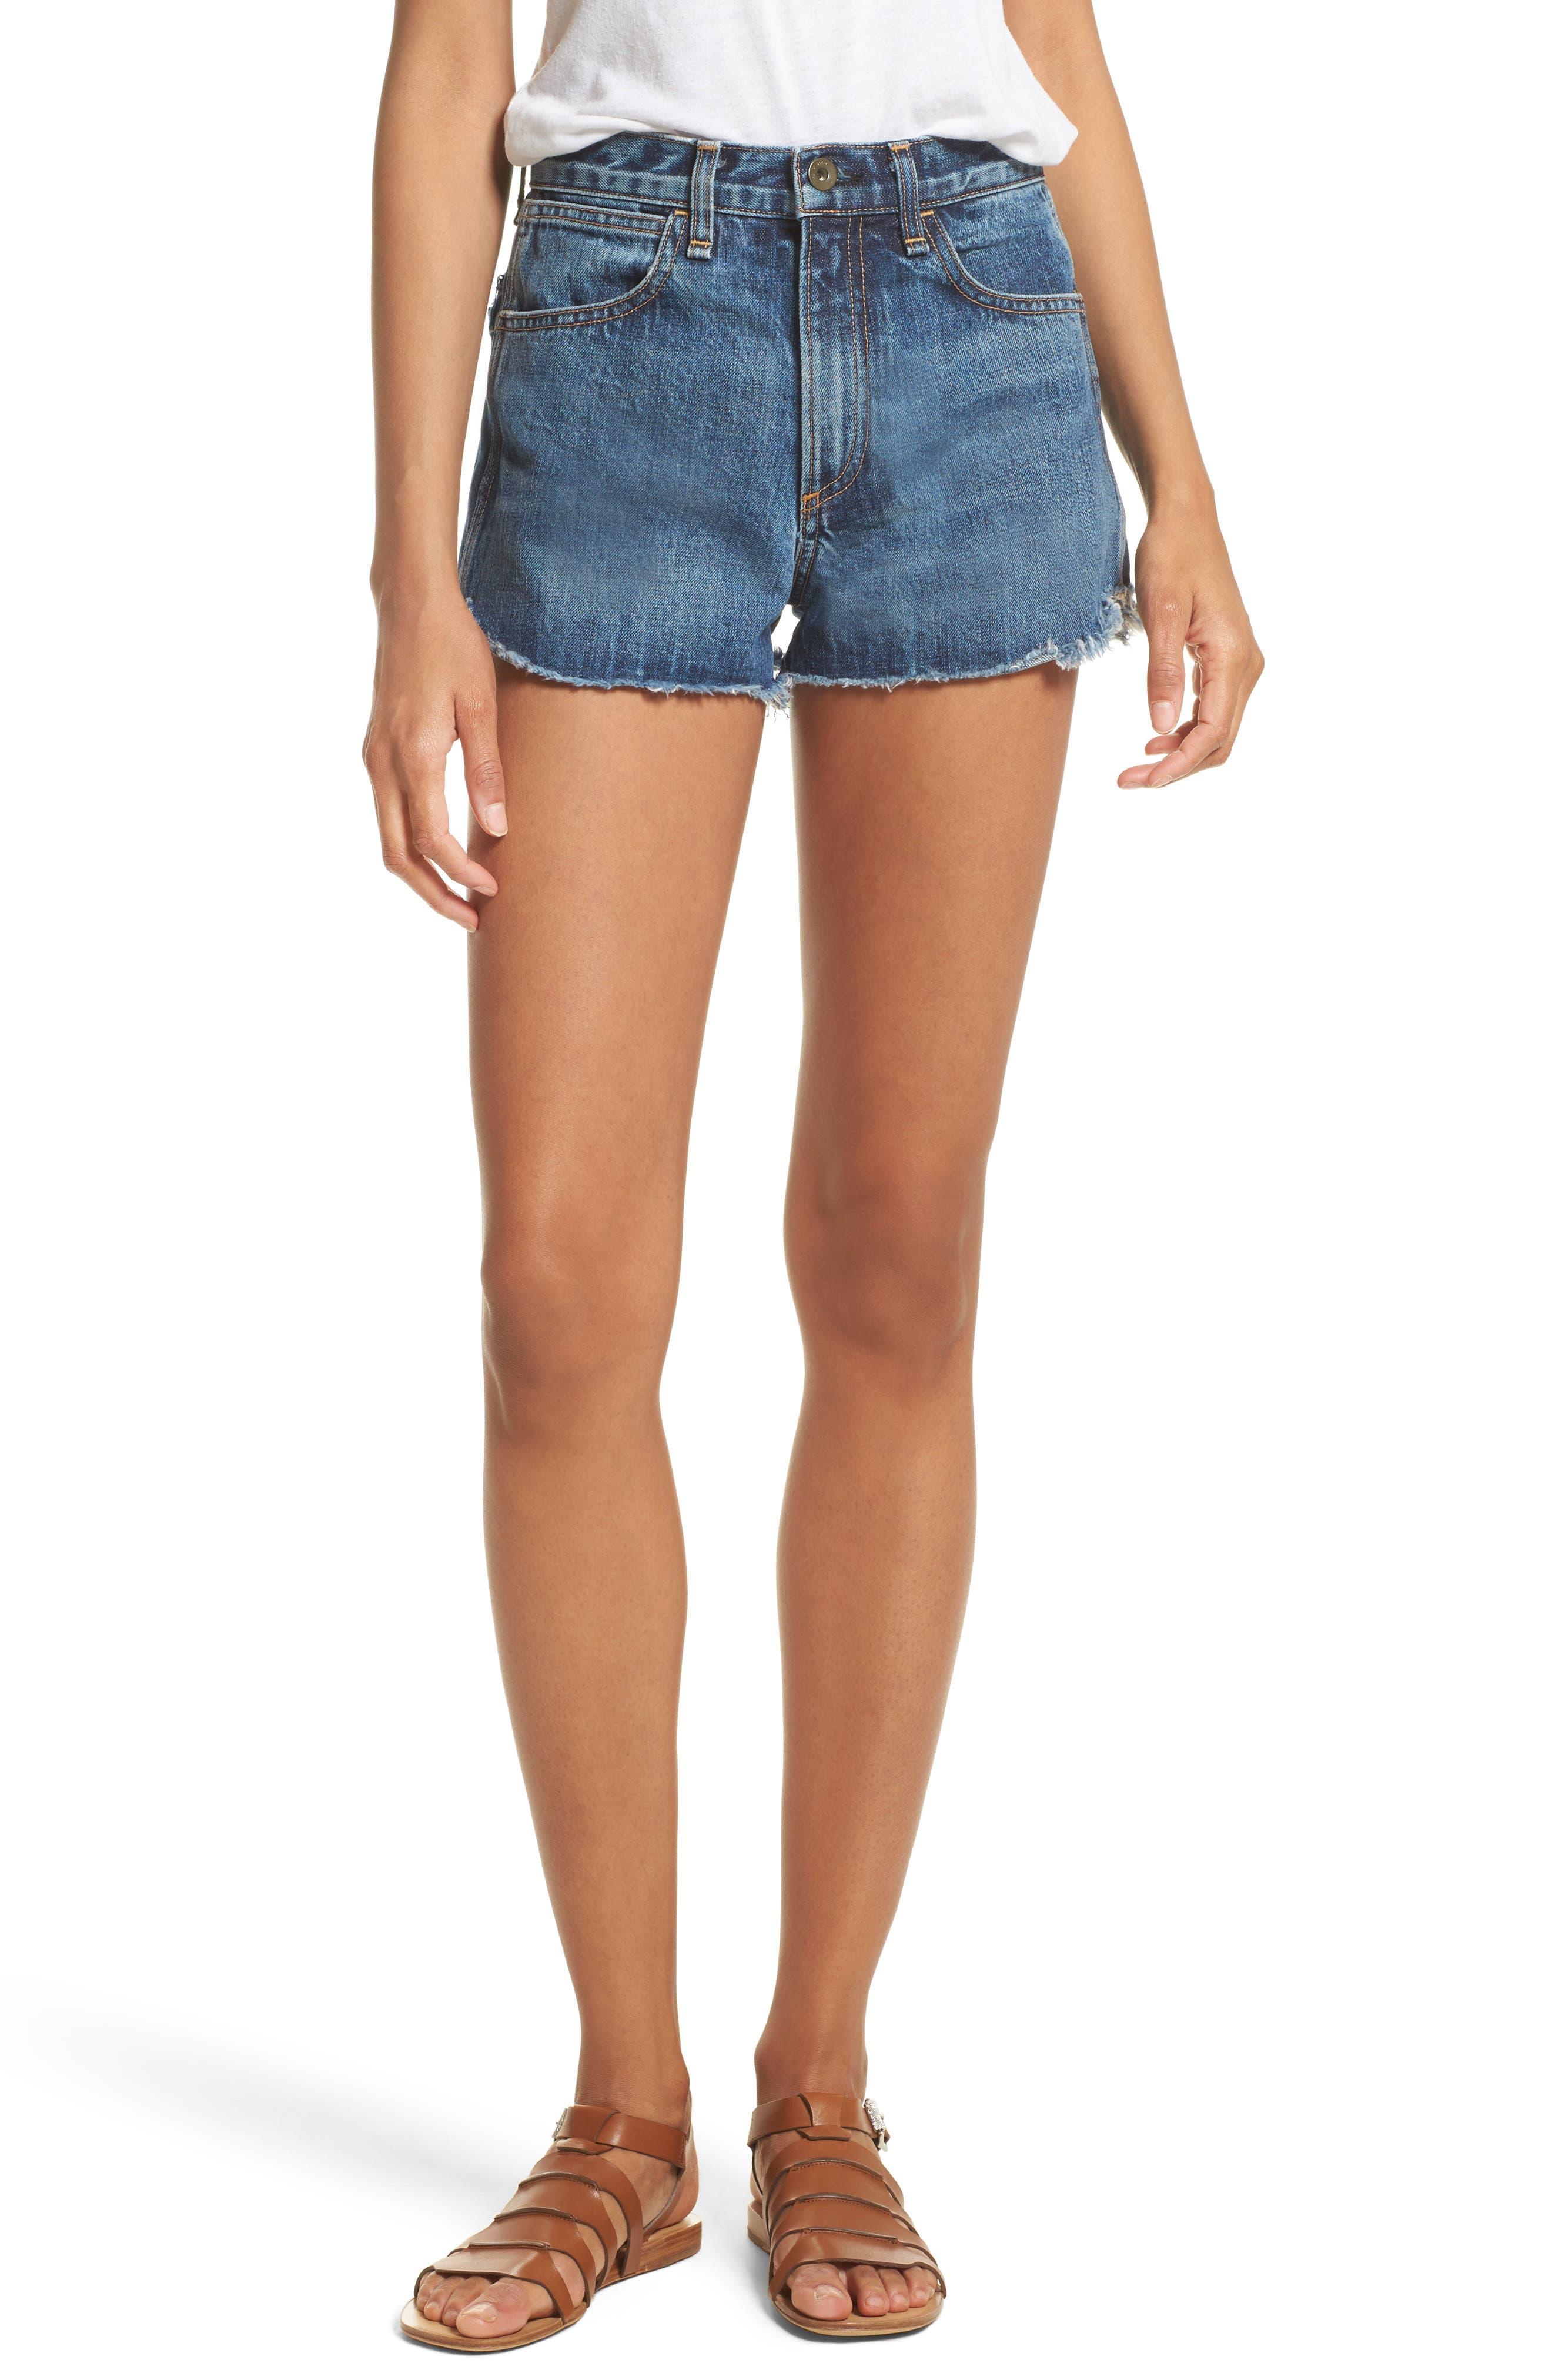 Alternate Image 1 Selected - rag & bone/JEAN Lou High Waist Cutoff Denim Shorts